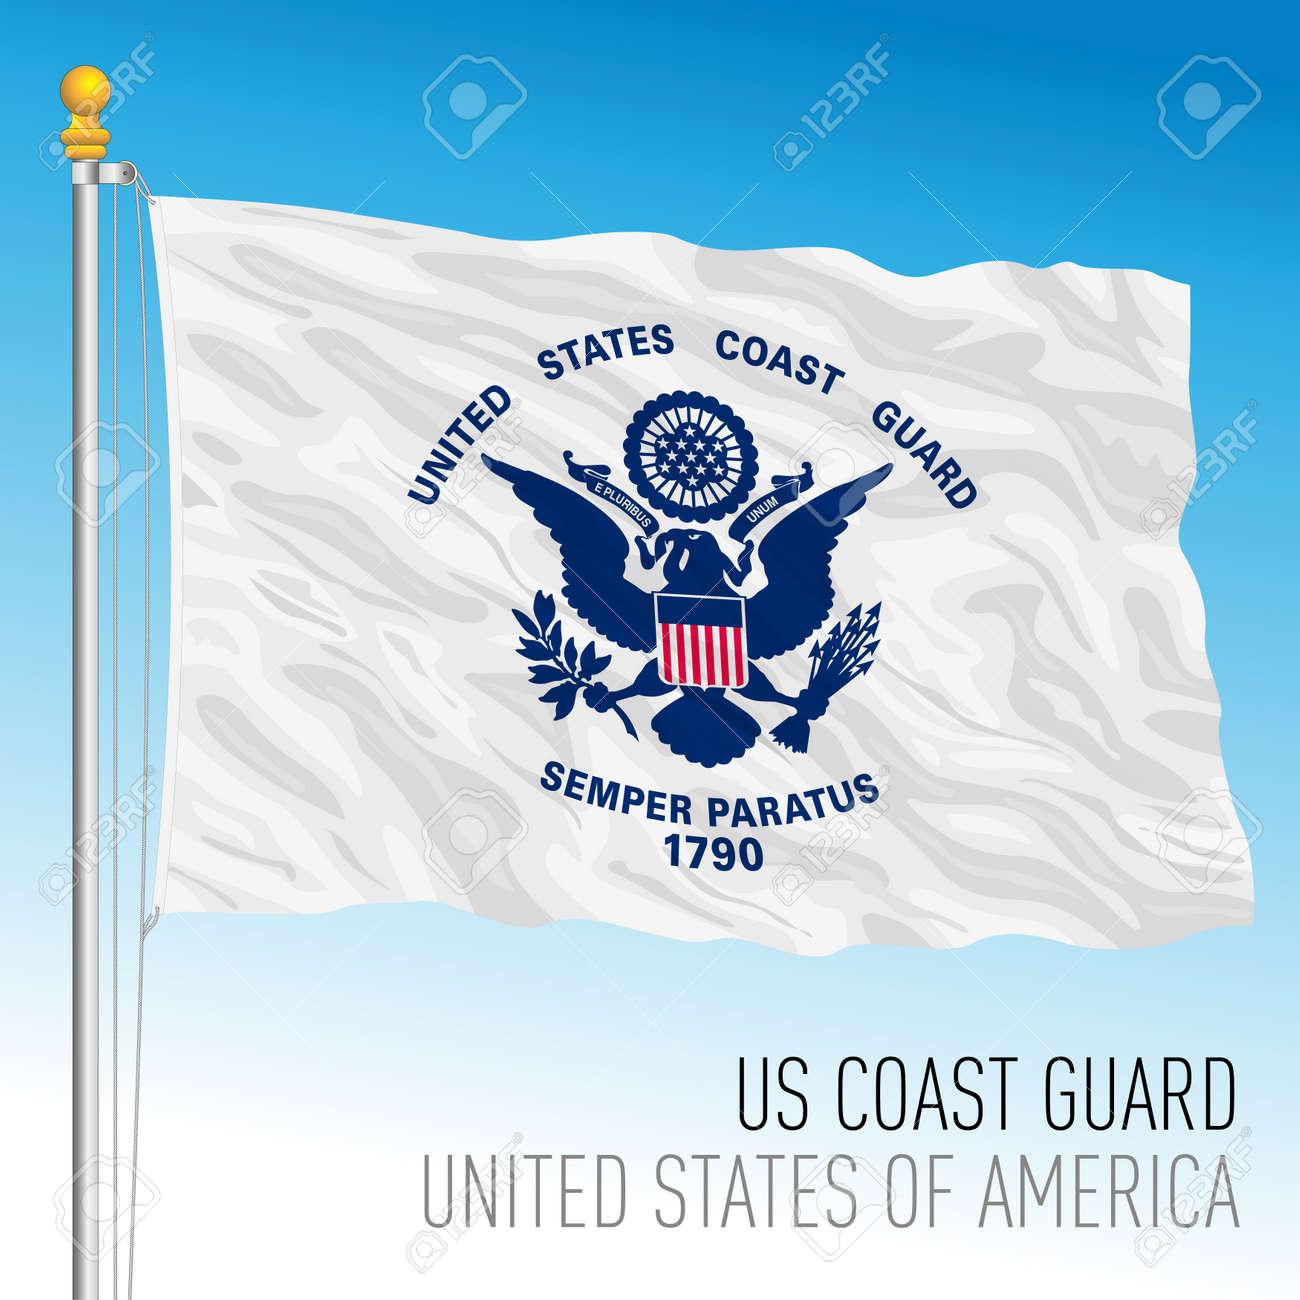 US Coast Guard flag, United States of America, vector illustration - 172958758